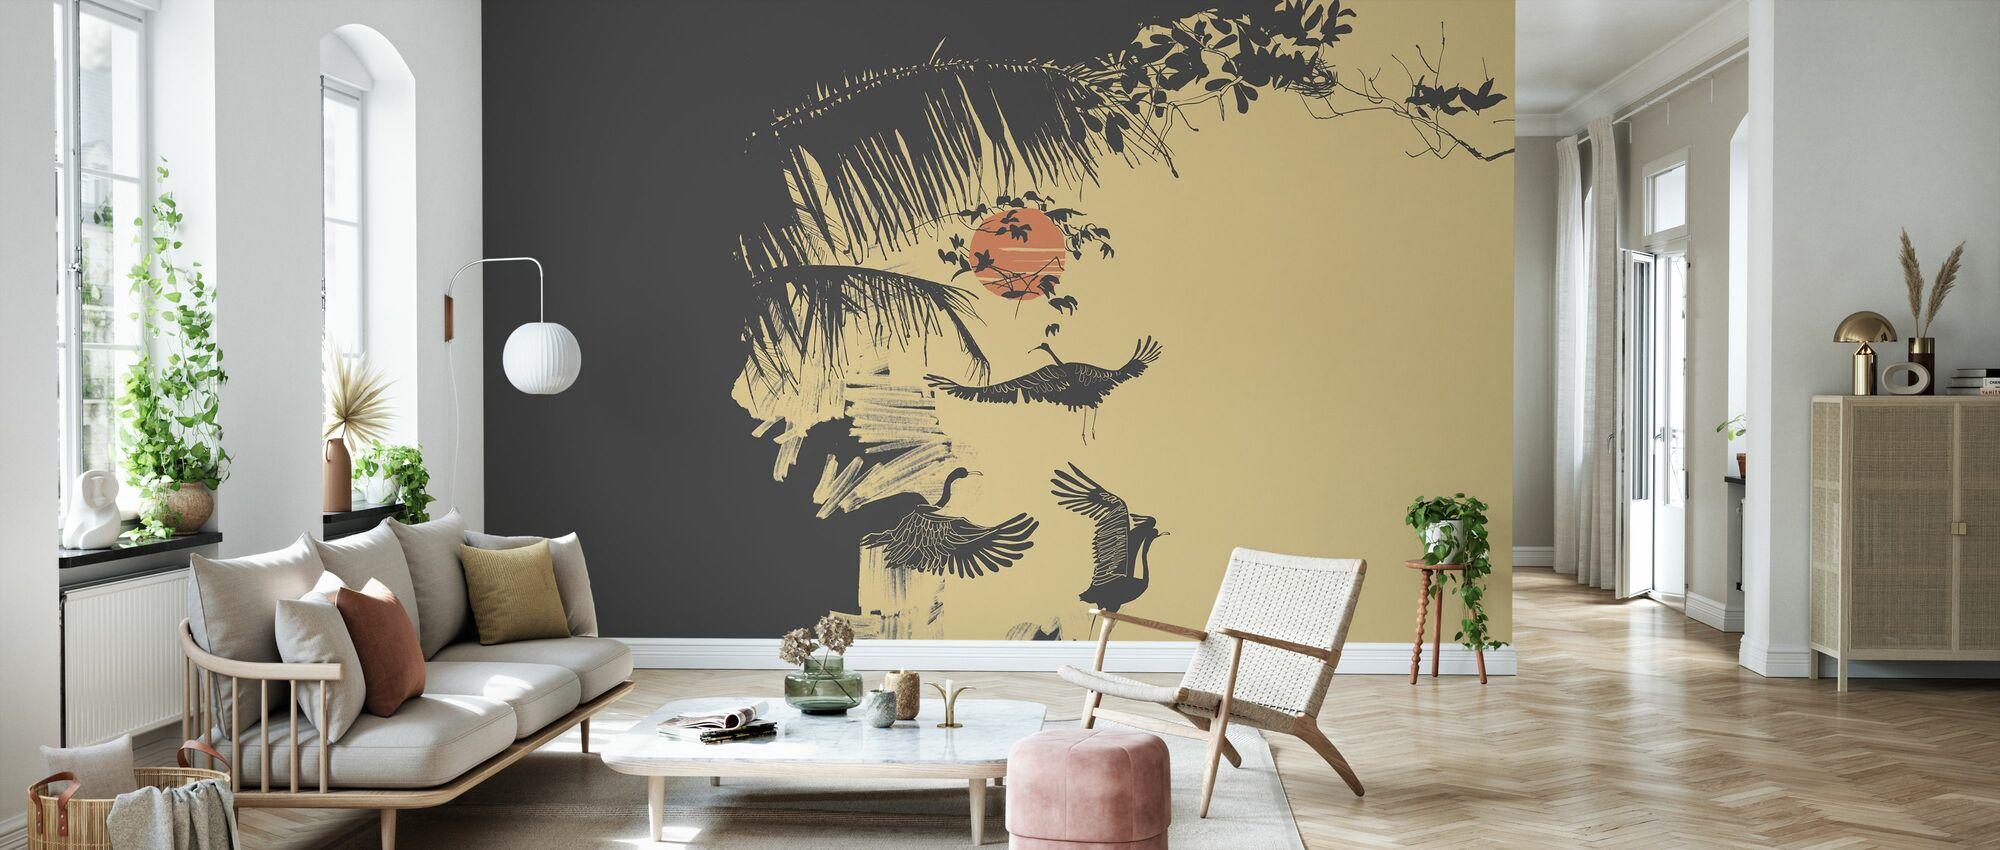 Early in Vietnam 1 - Wallpaper - Living Room